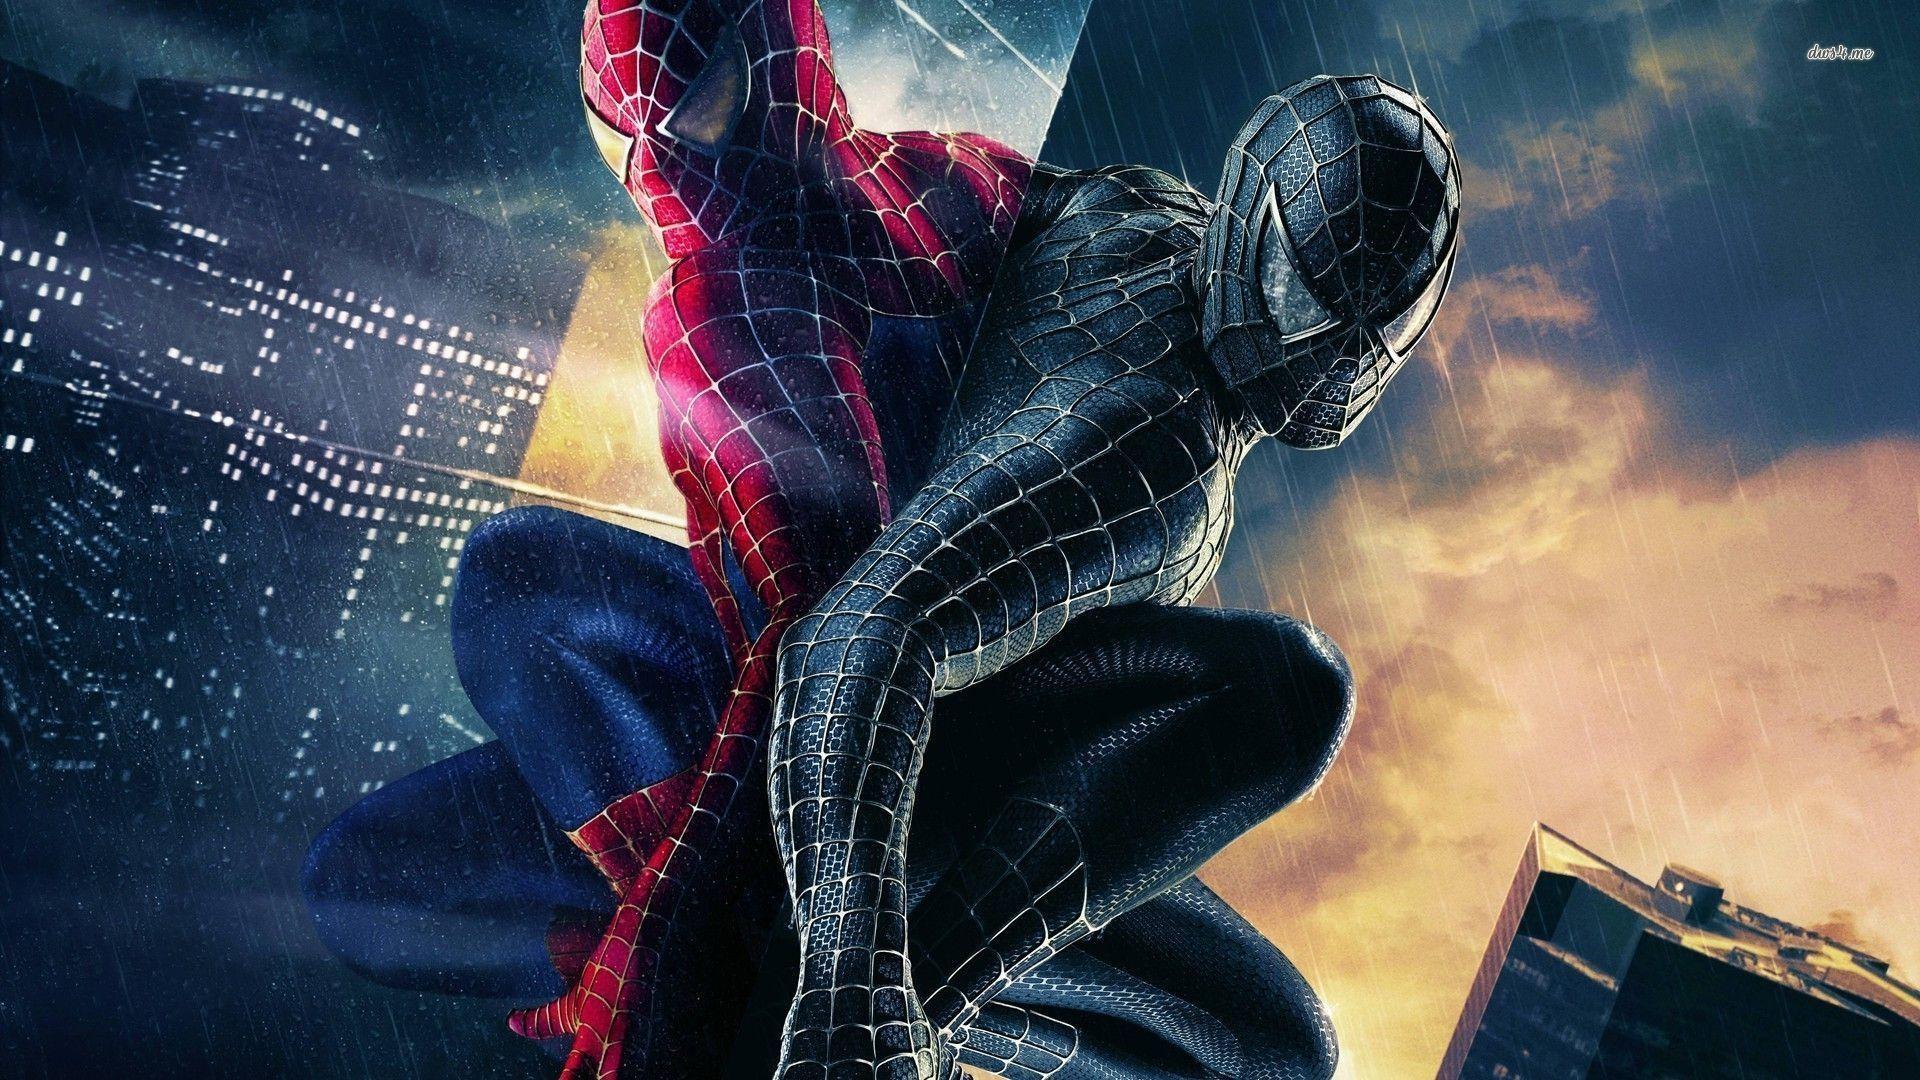 Spider-man 3 wallpaper 9 1024 x 768 | stmed. Net.